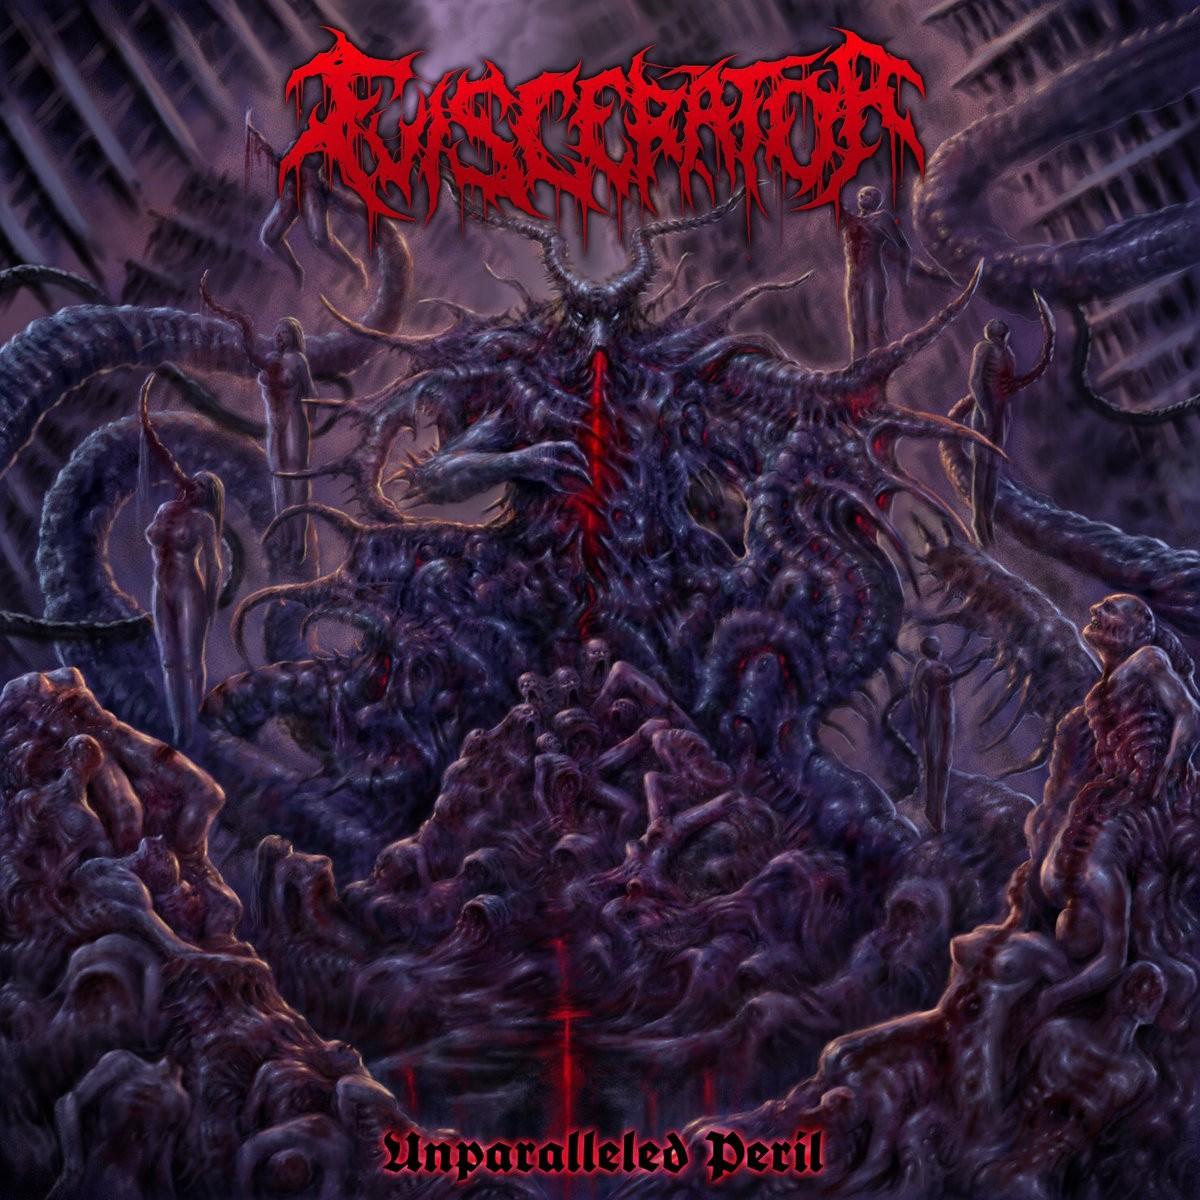 Eviscerator - Unparalleled Peril [EP]